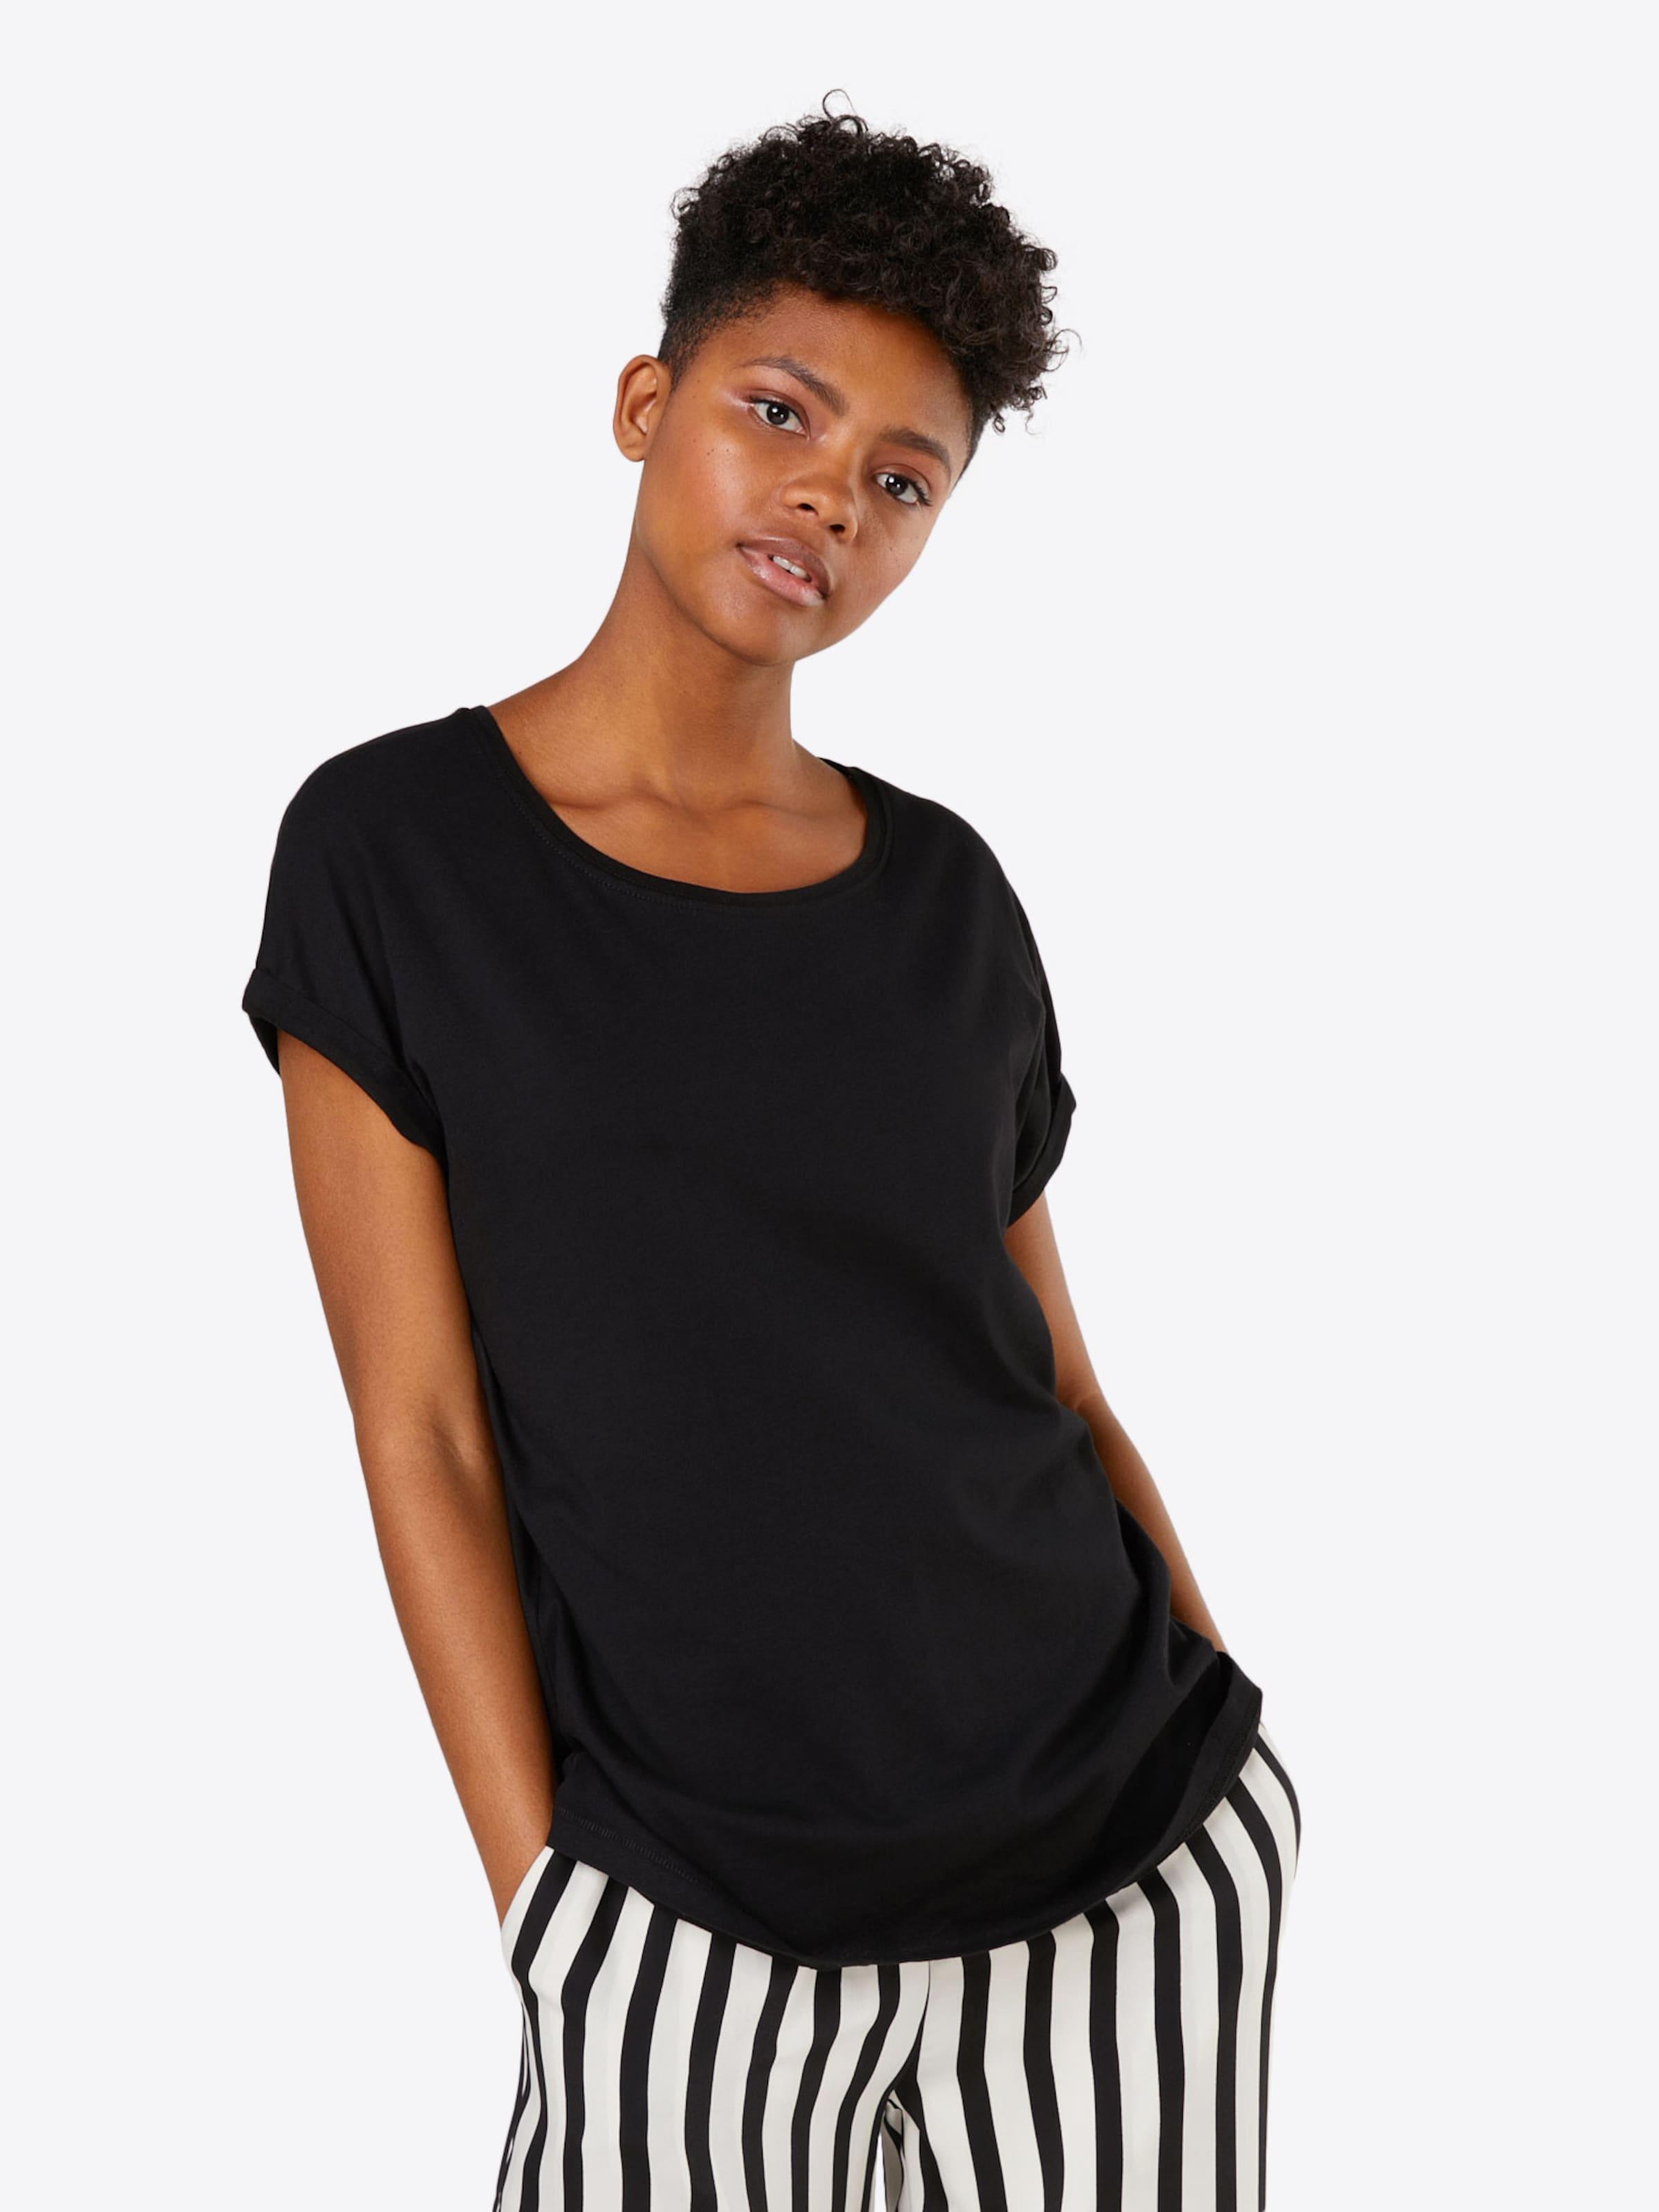 T Shoulder Tee' 'ladies Noir Extended En Urban Classics shirt SUMVpz